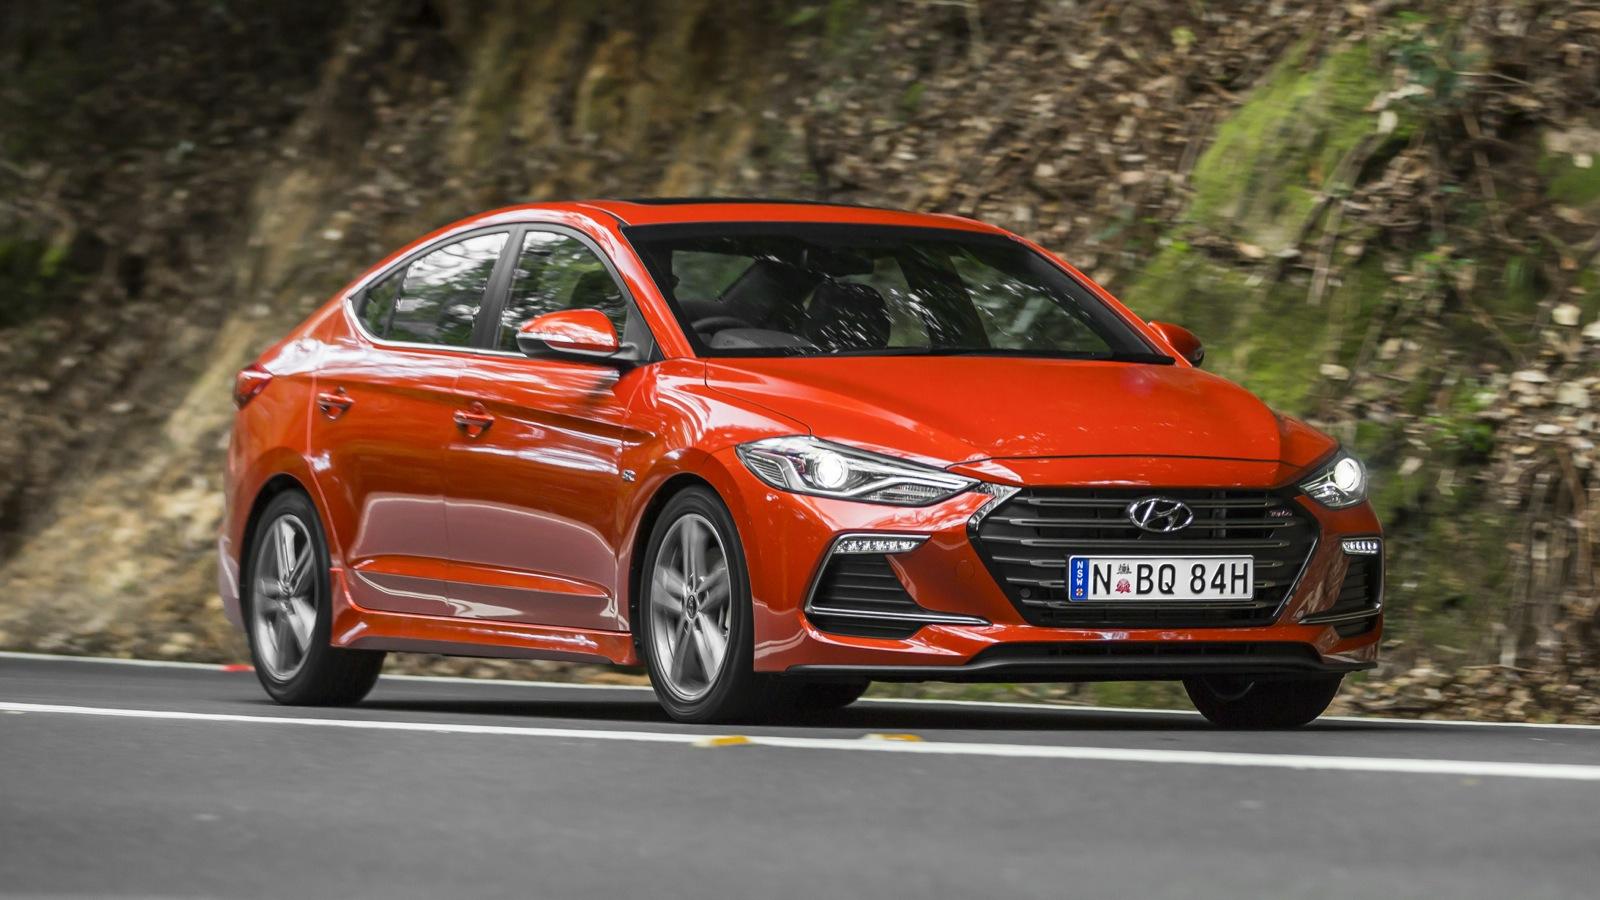 2016 Hyundai Elantra Limited >> 2017 Hyundai Elantra SR Turbo Review | CarAdvice